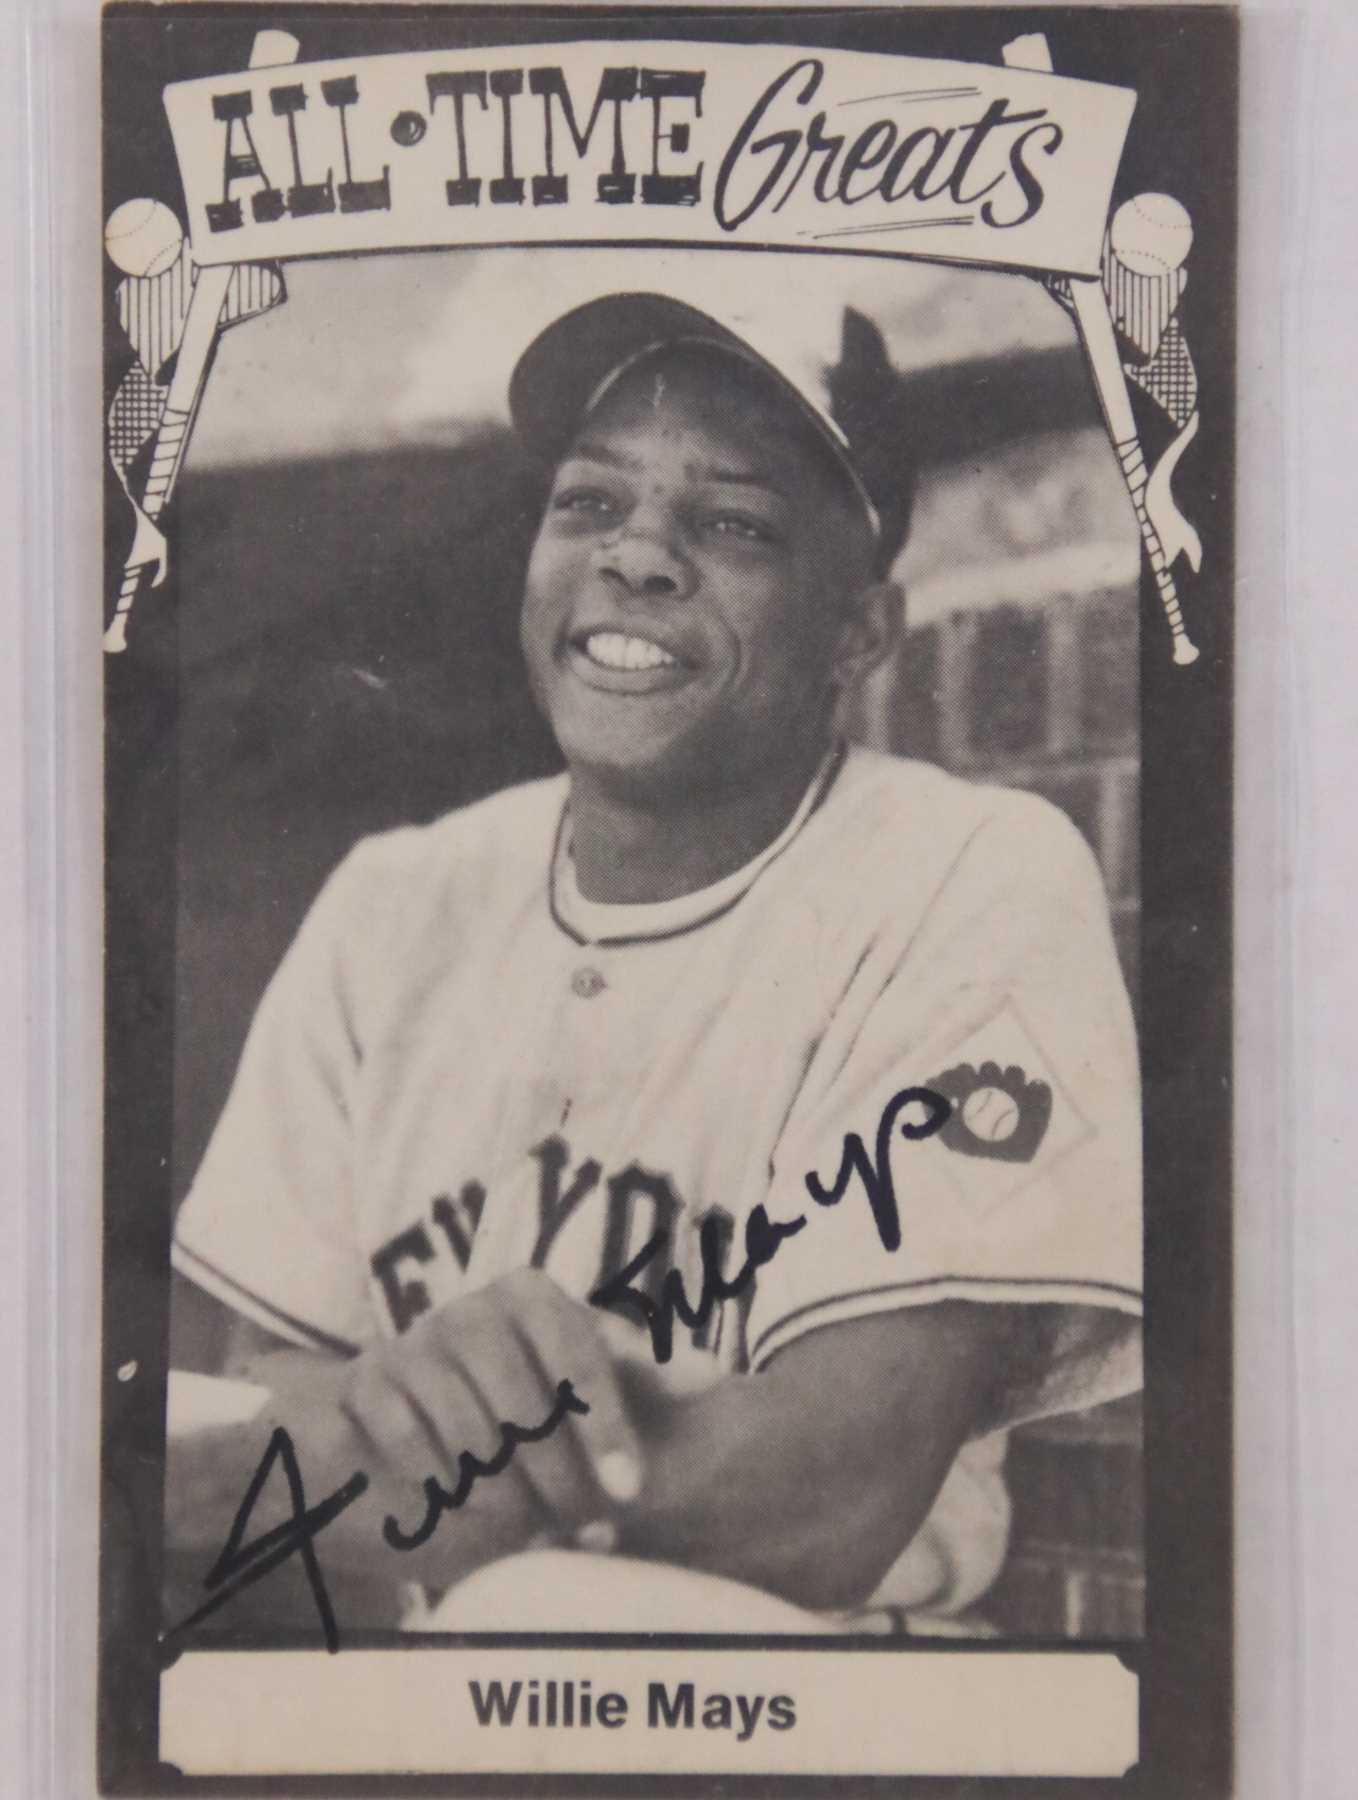 Auctionaacsautographscom Willie Mays Autographed Vintage